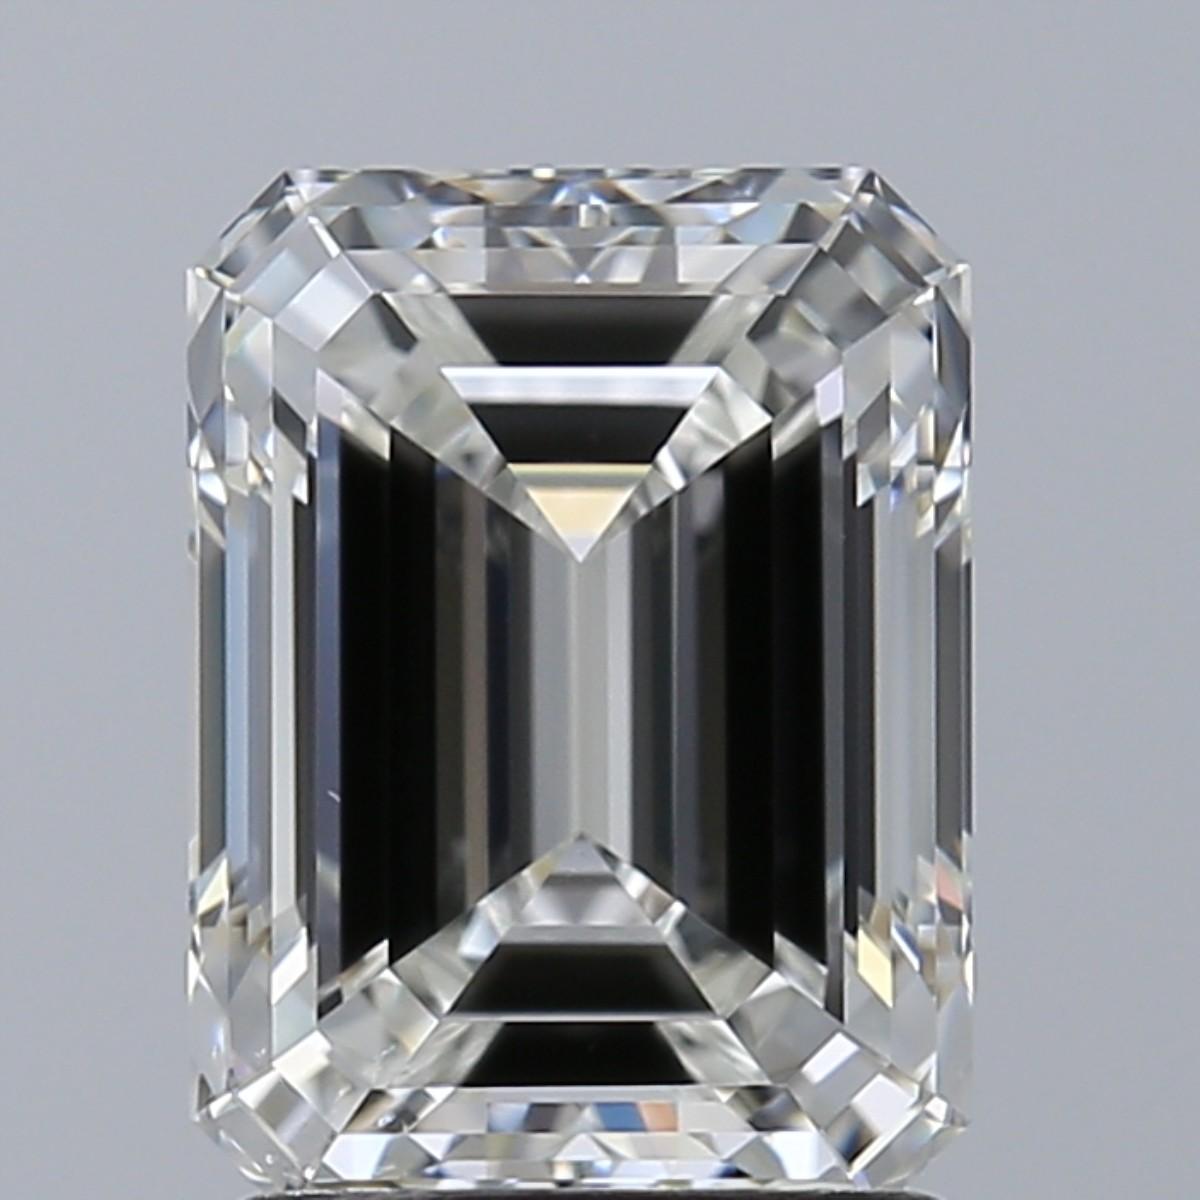 Emerald 2.01 Carat G Color VS2 Clarity For Sale